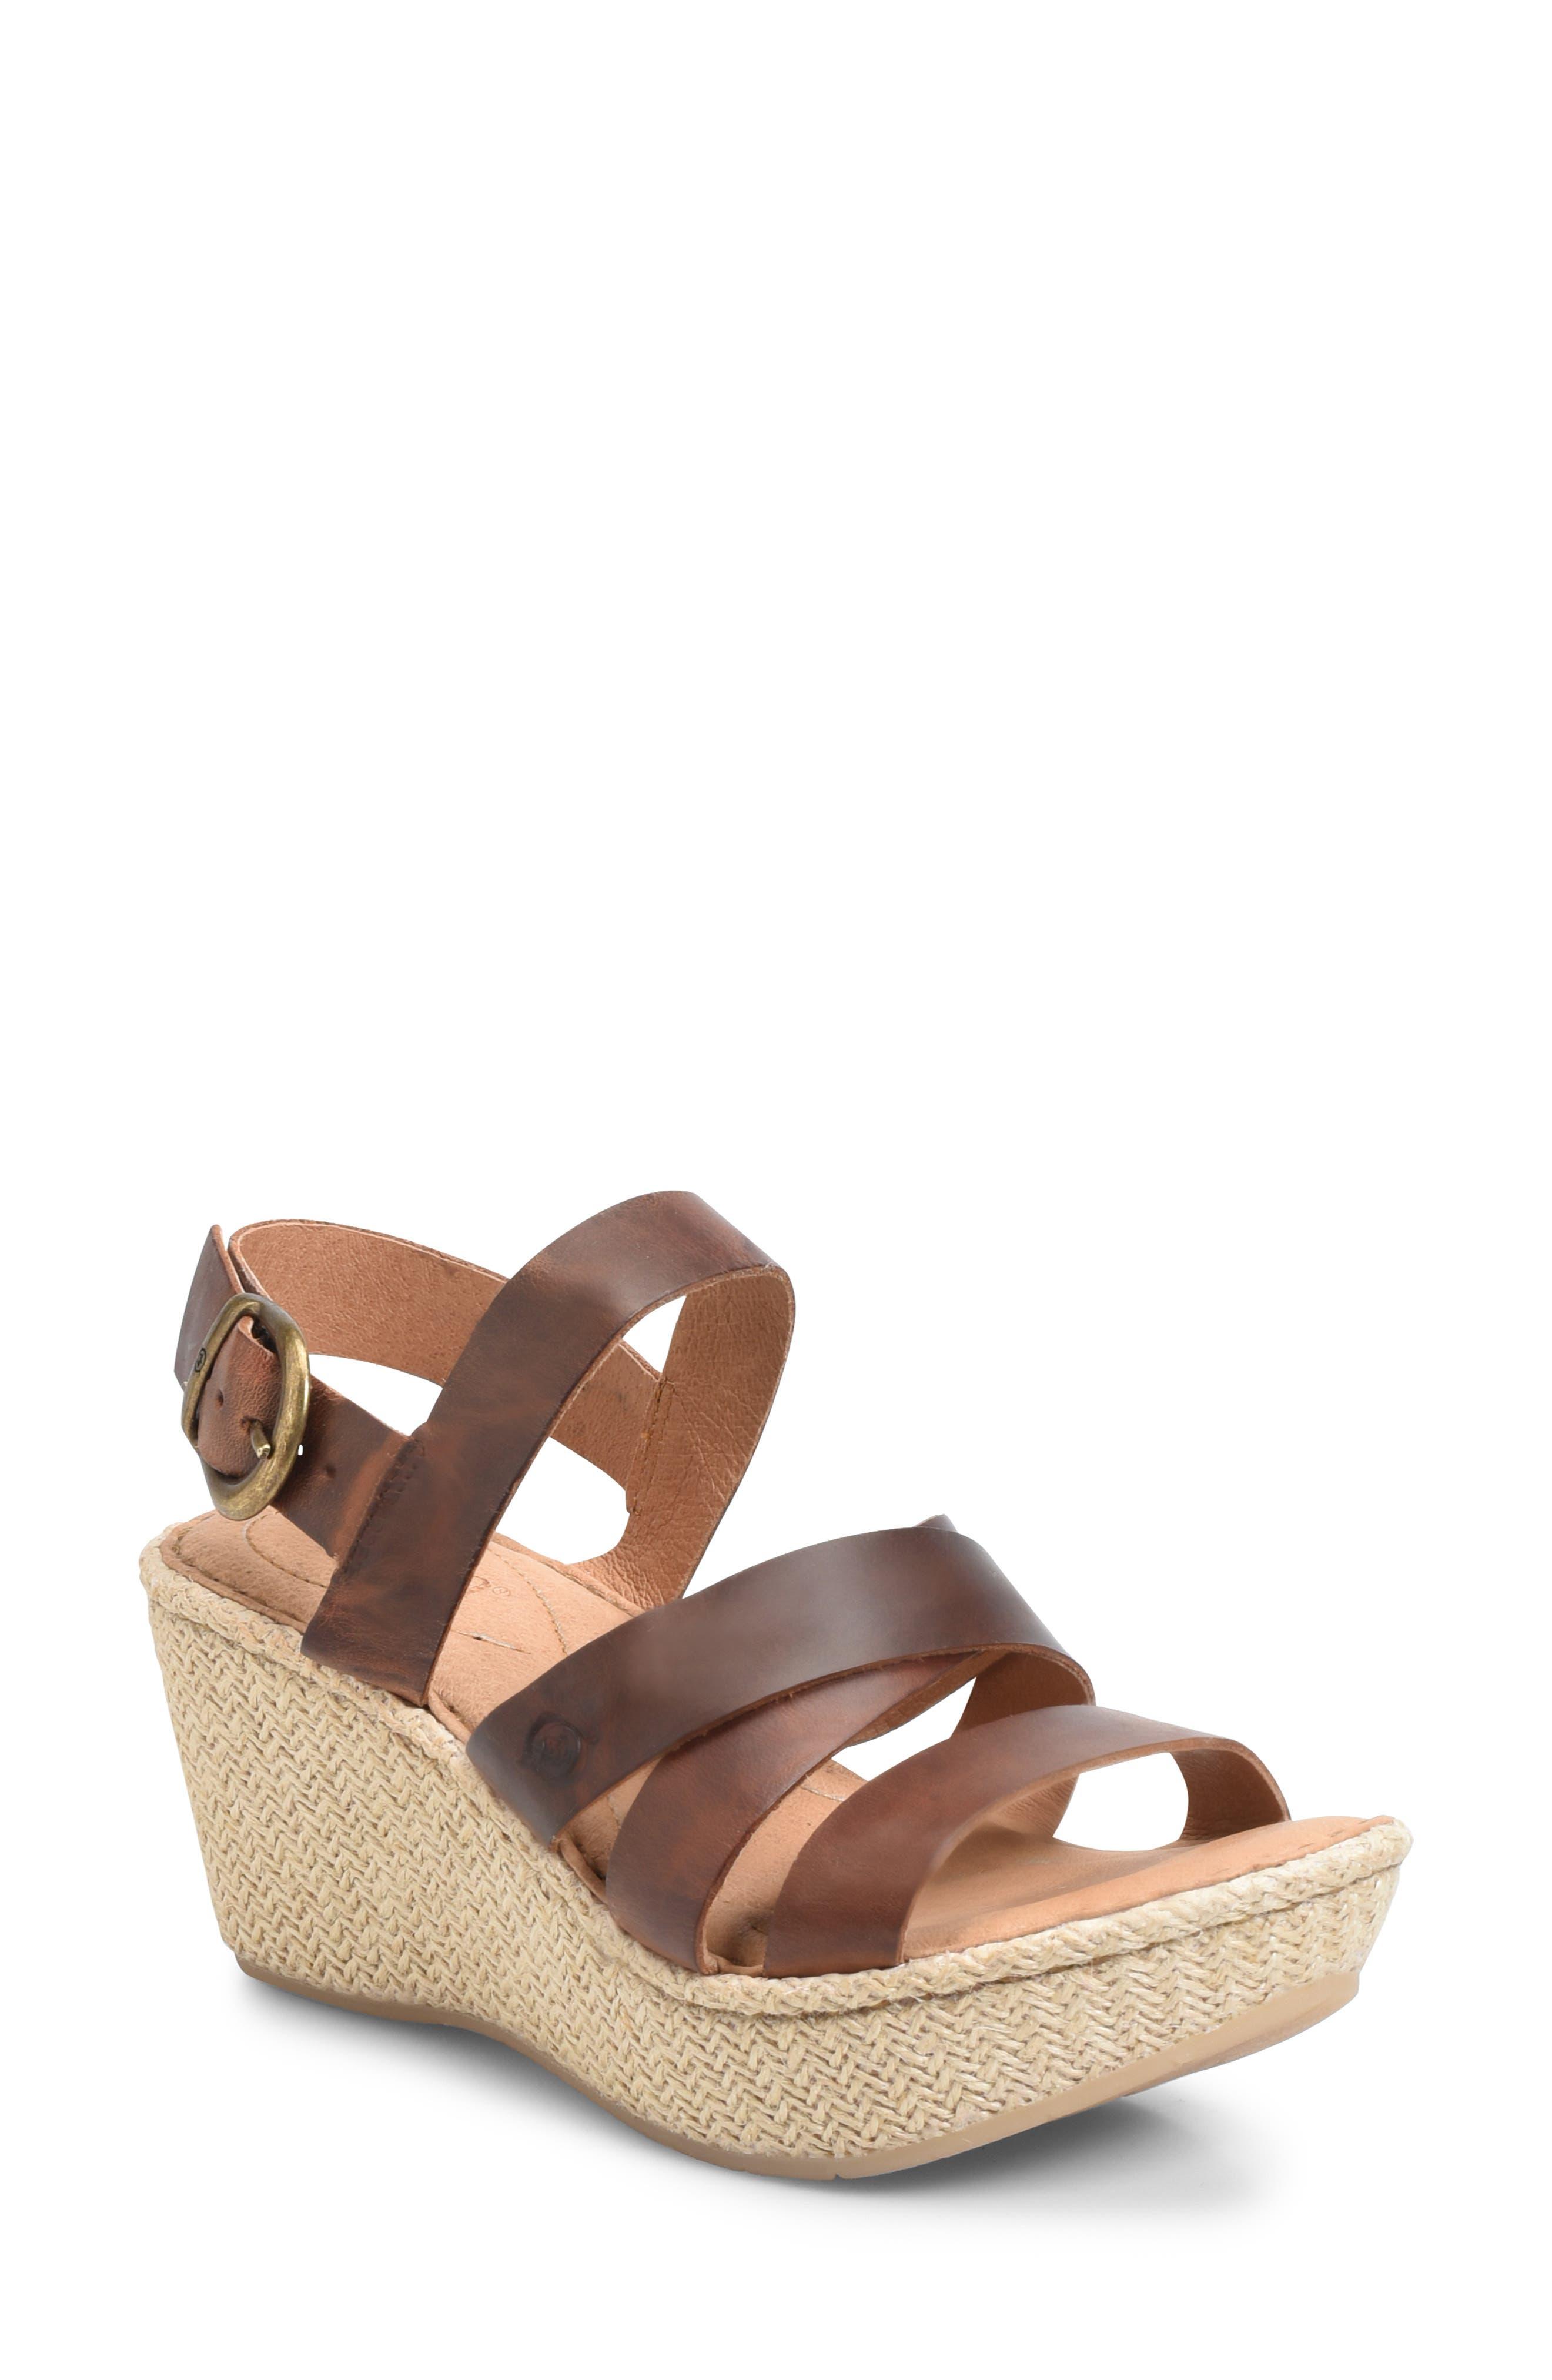 Petur Wedge Sandal,                         Main,                         color, BROWN LEATHER